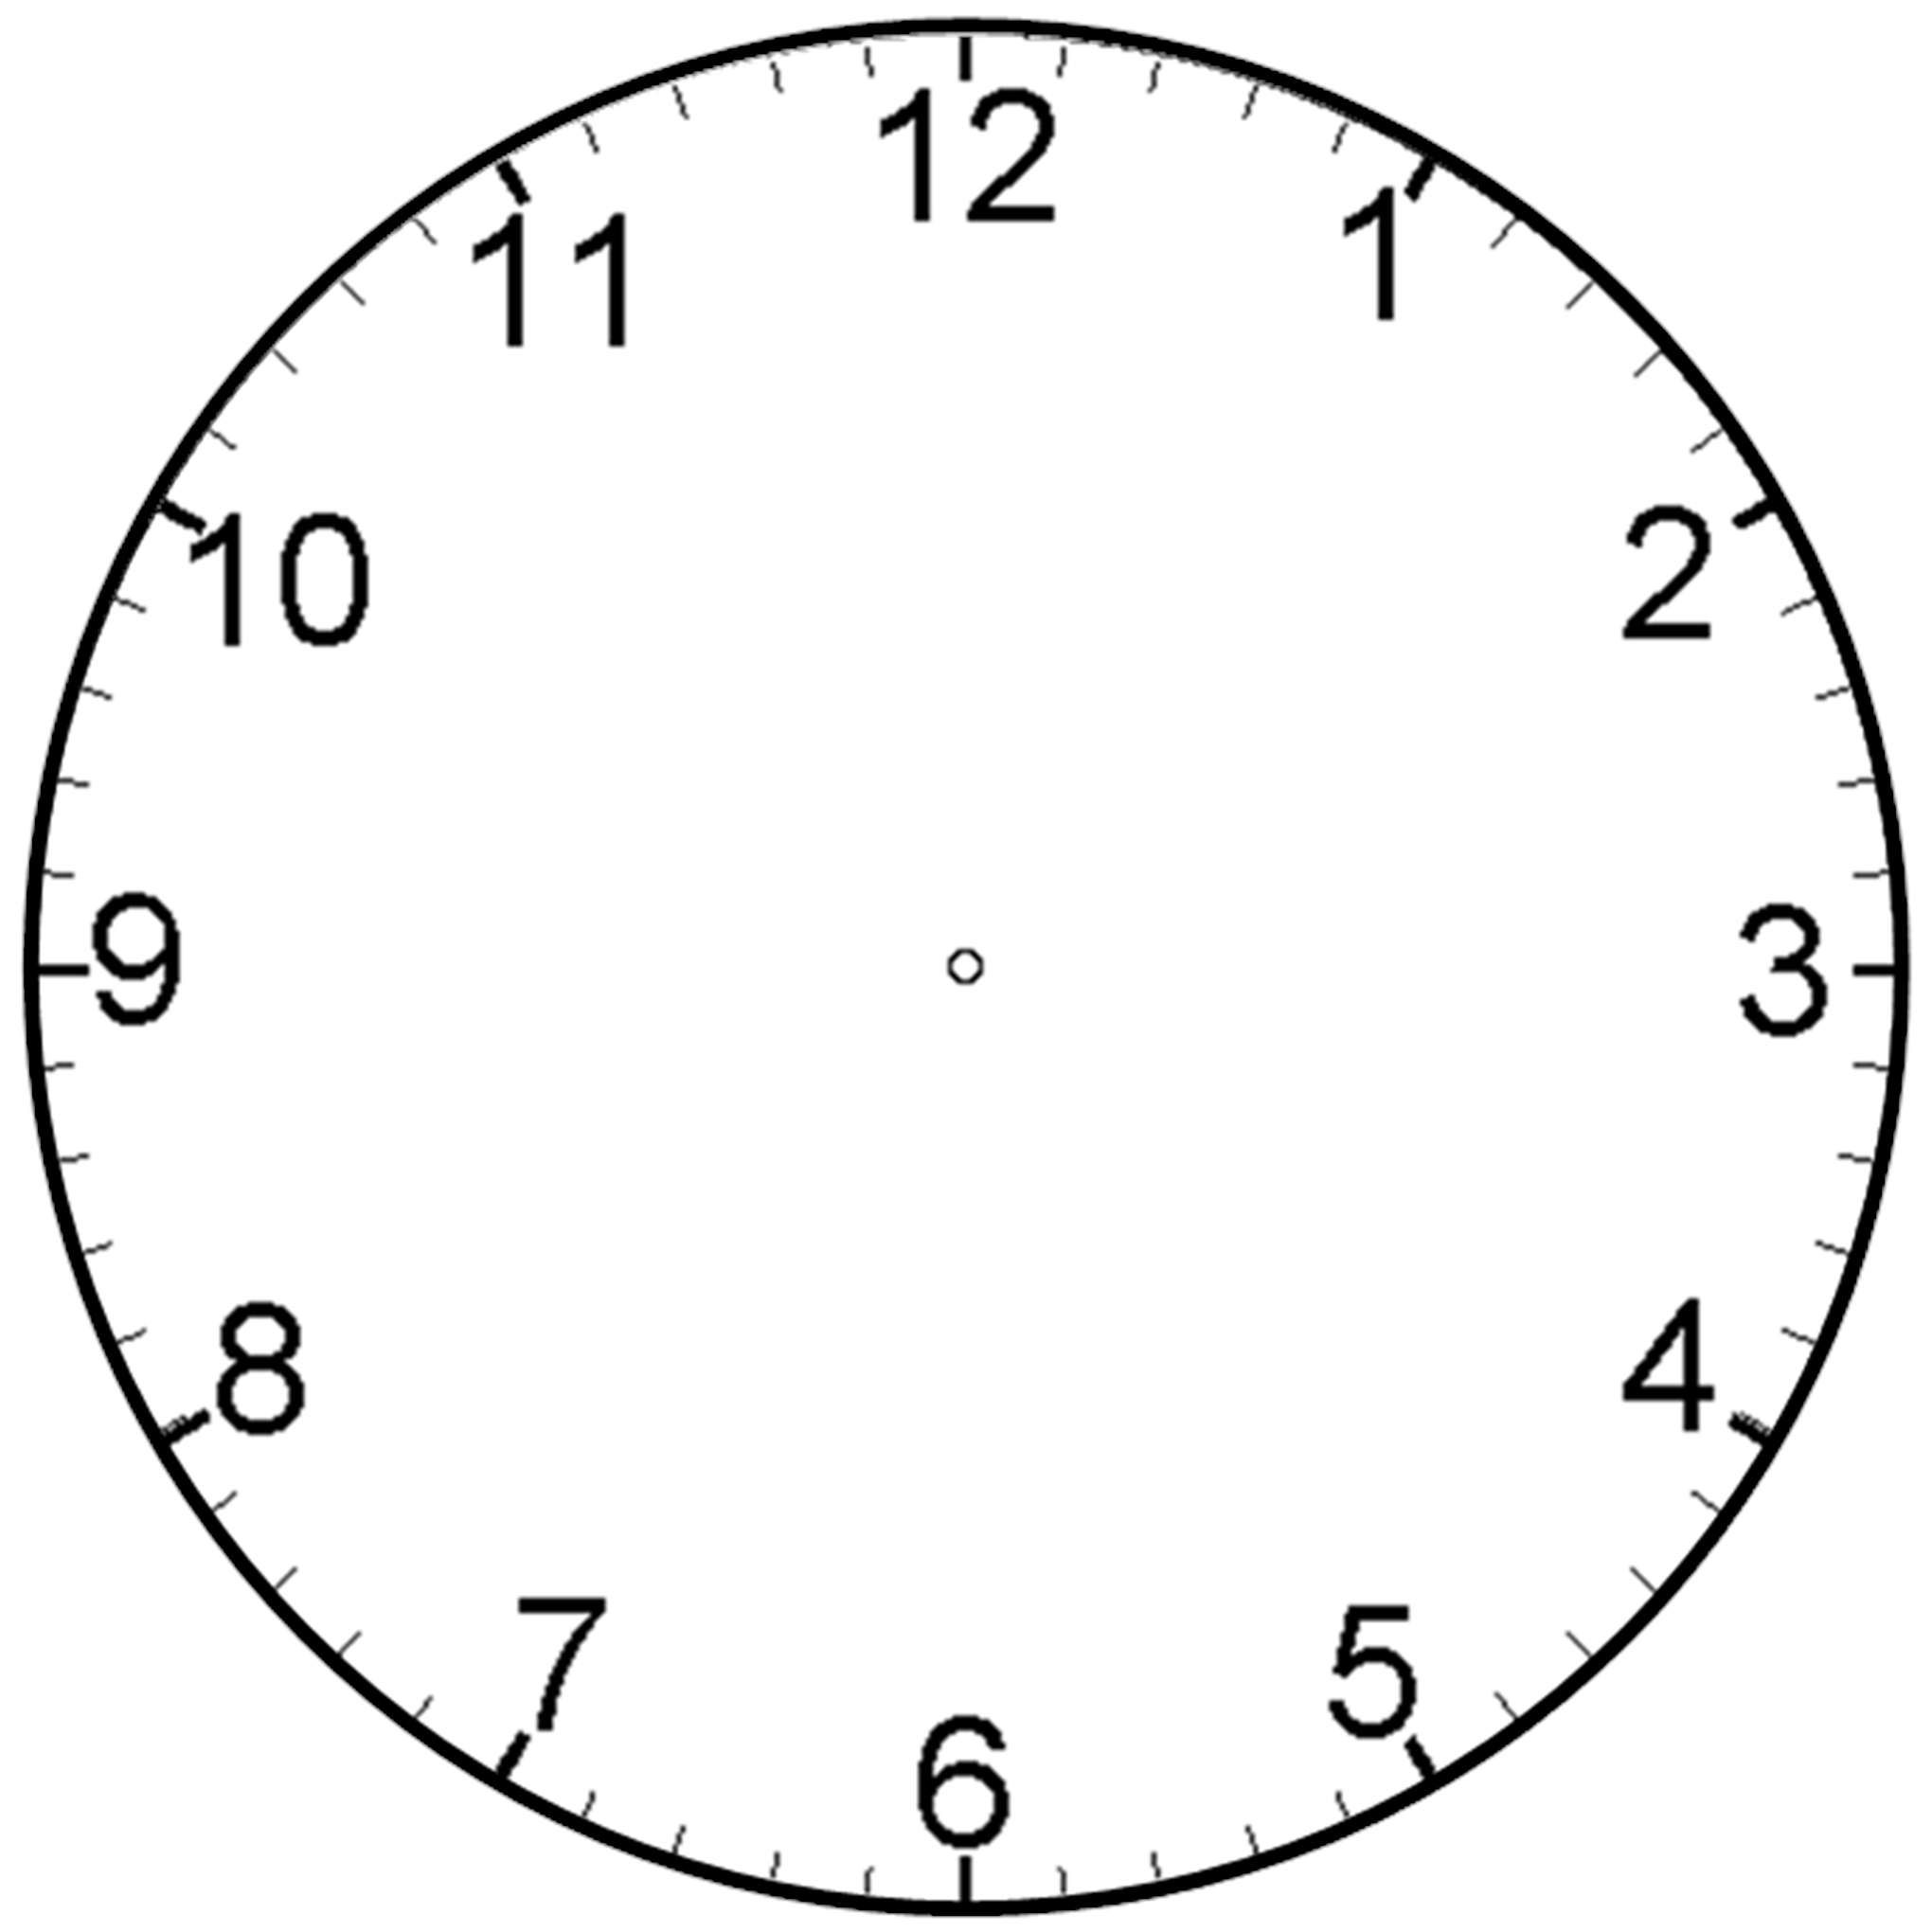 Blank Clock Clipart 9tzeojyjc Jpeg More-Blank Clock Clipart 9tzeojyjc Jpeg More-6